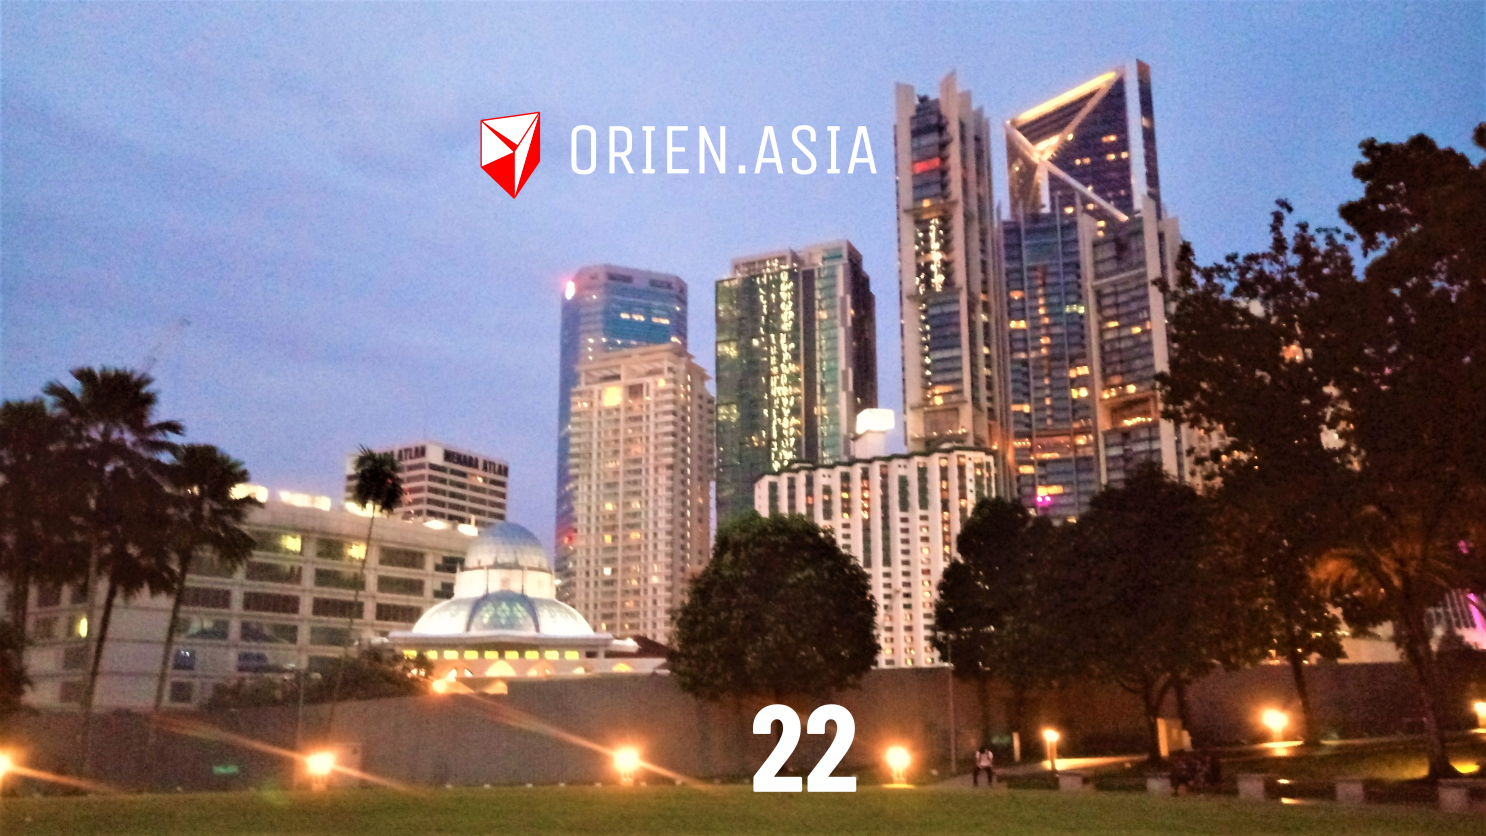 Advent calendar 2020 - 22: Kuala Lumpur, Malaysia